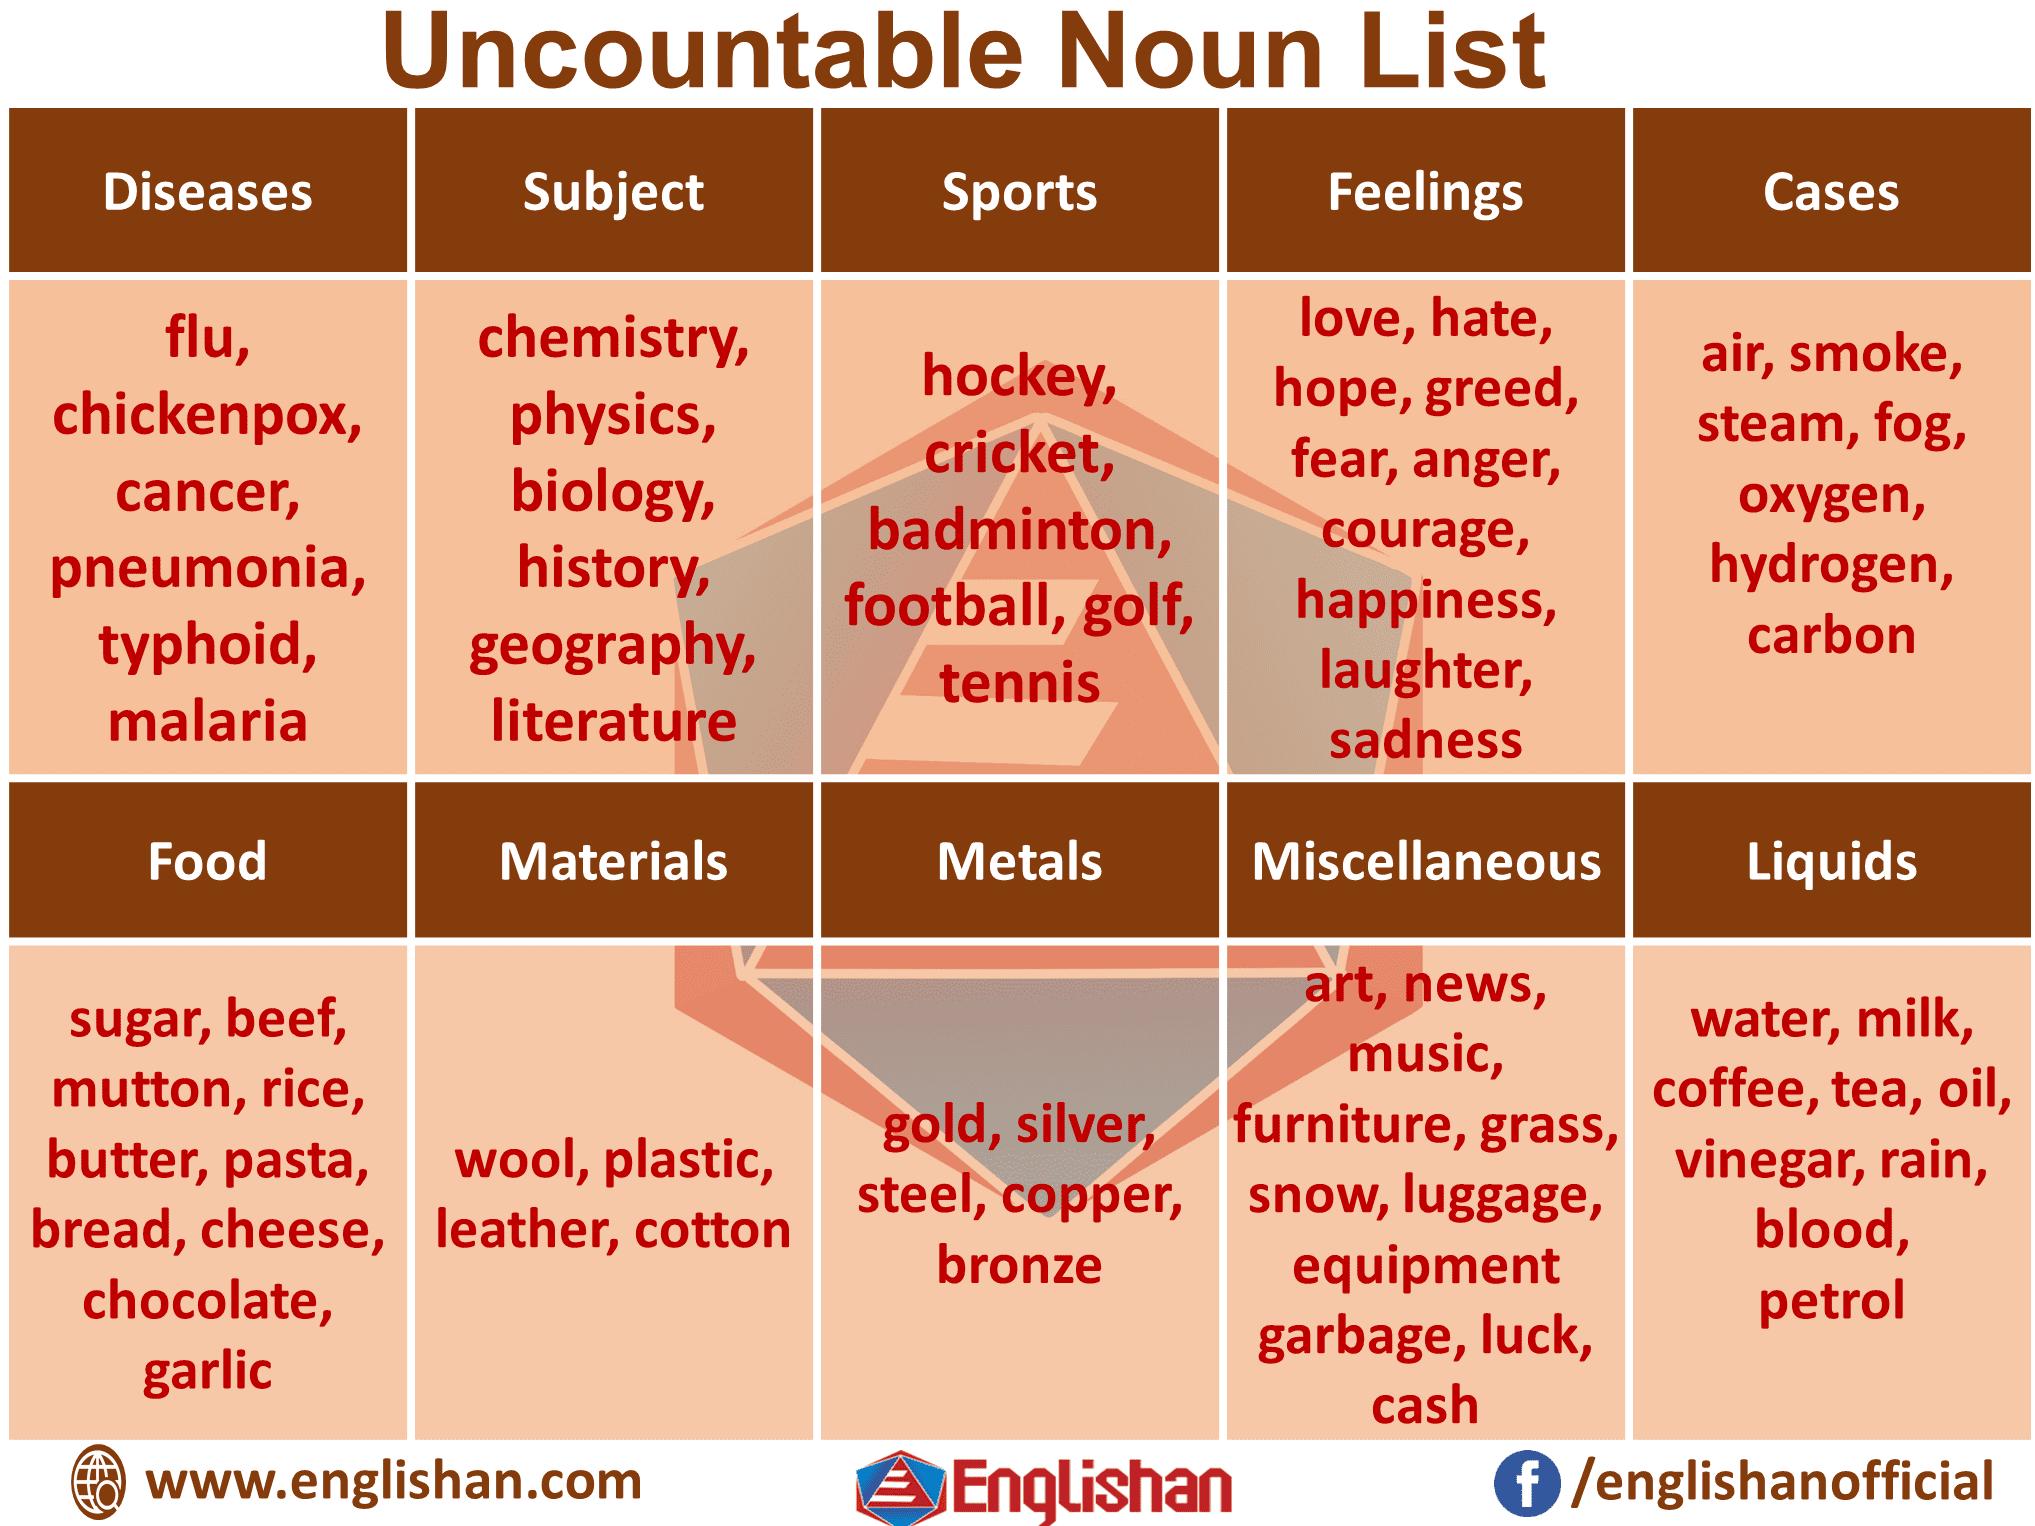 Uncountable Noun List